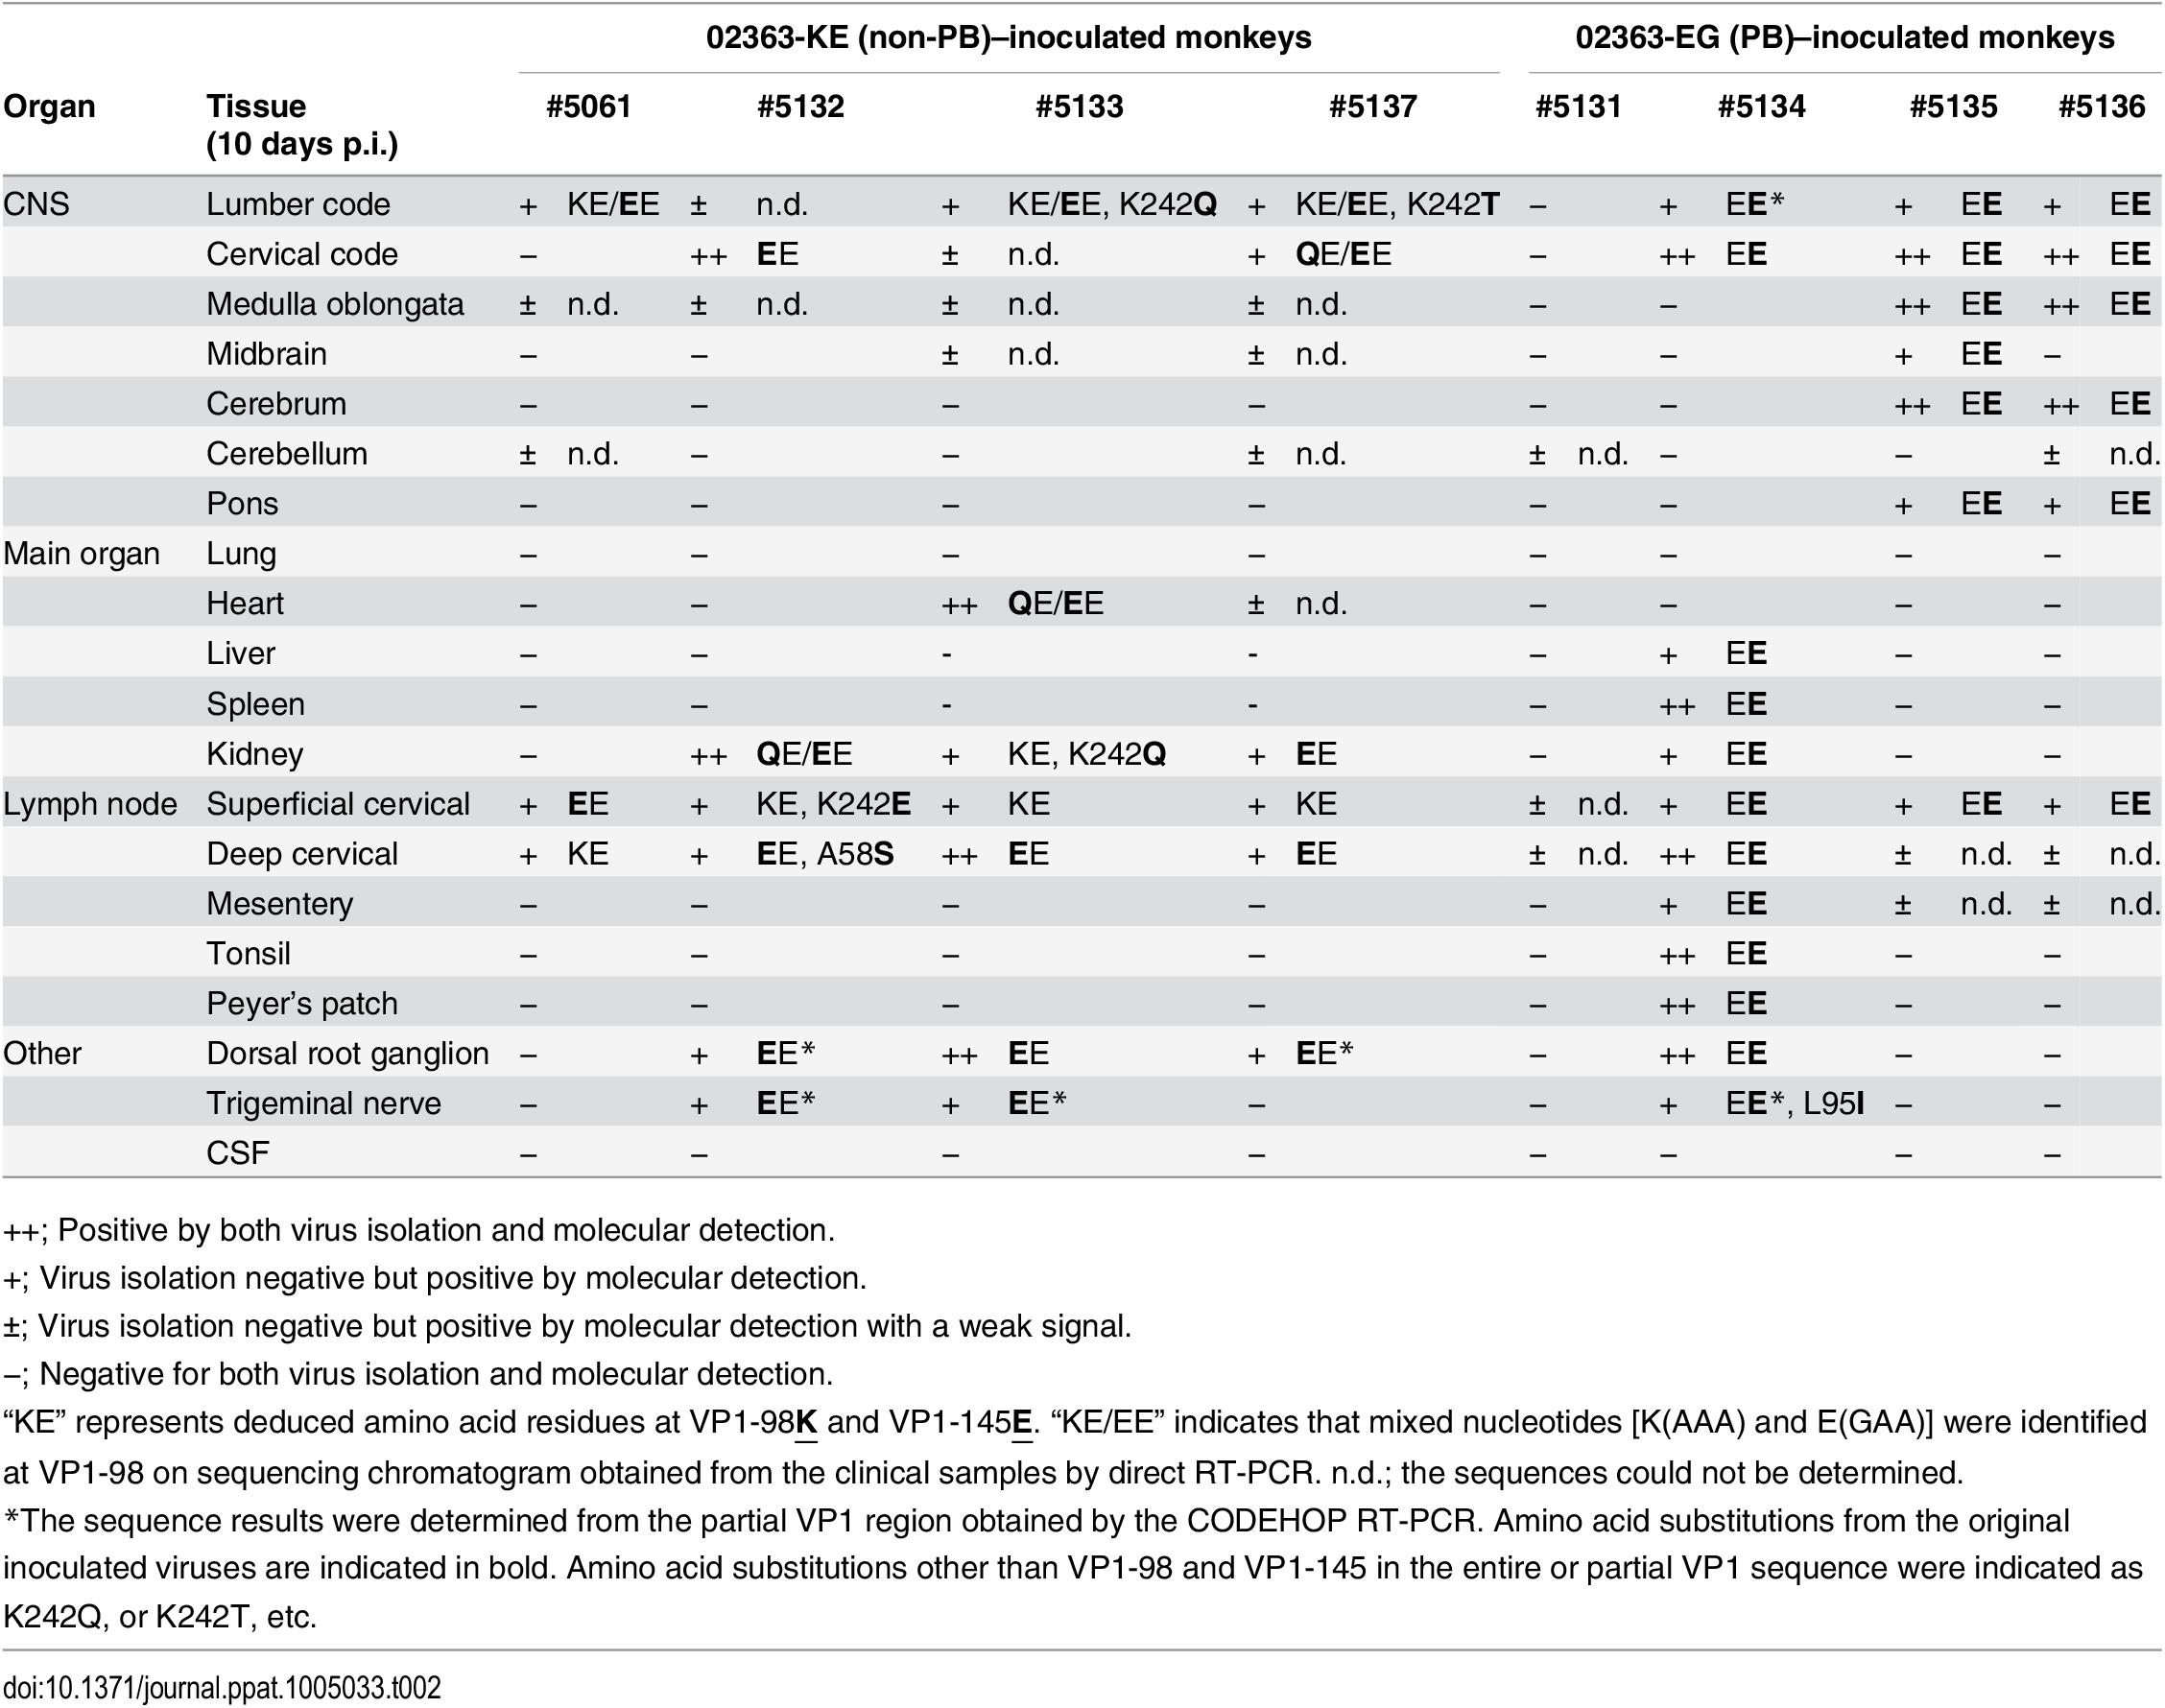 Amino acid residues at VP1-98 and VP1-145 of EV71 variants in postmortem tissue samples.